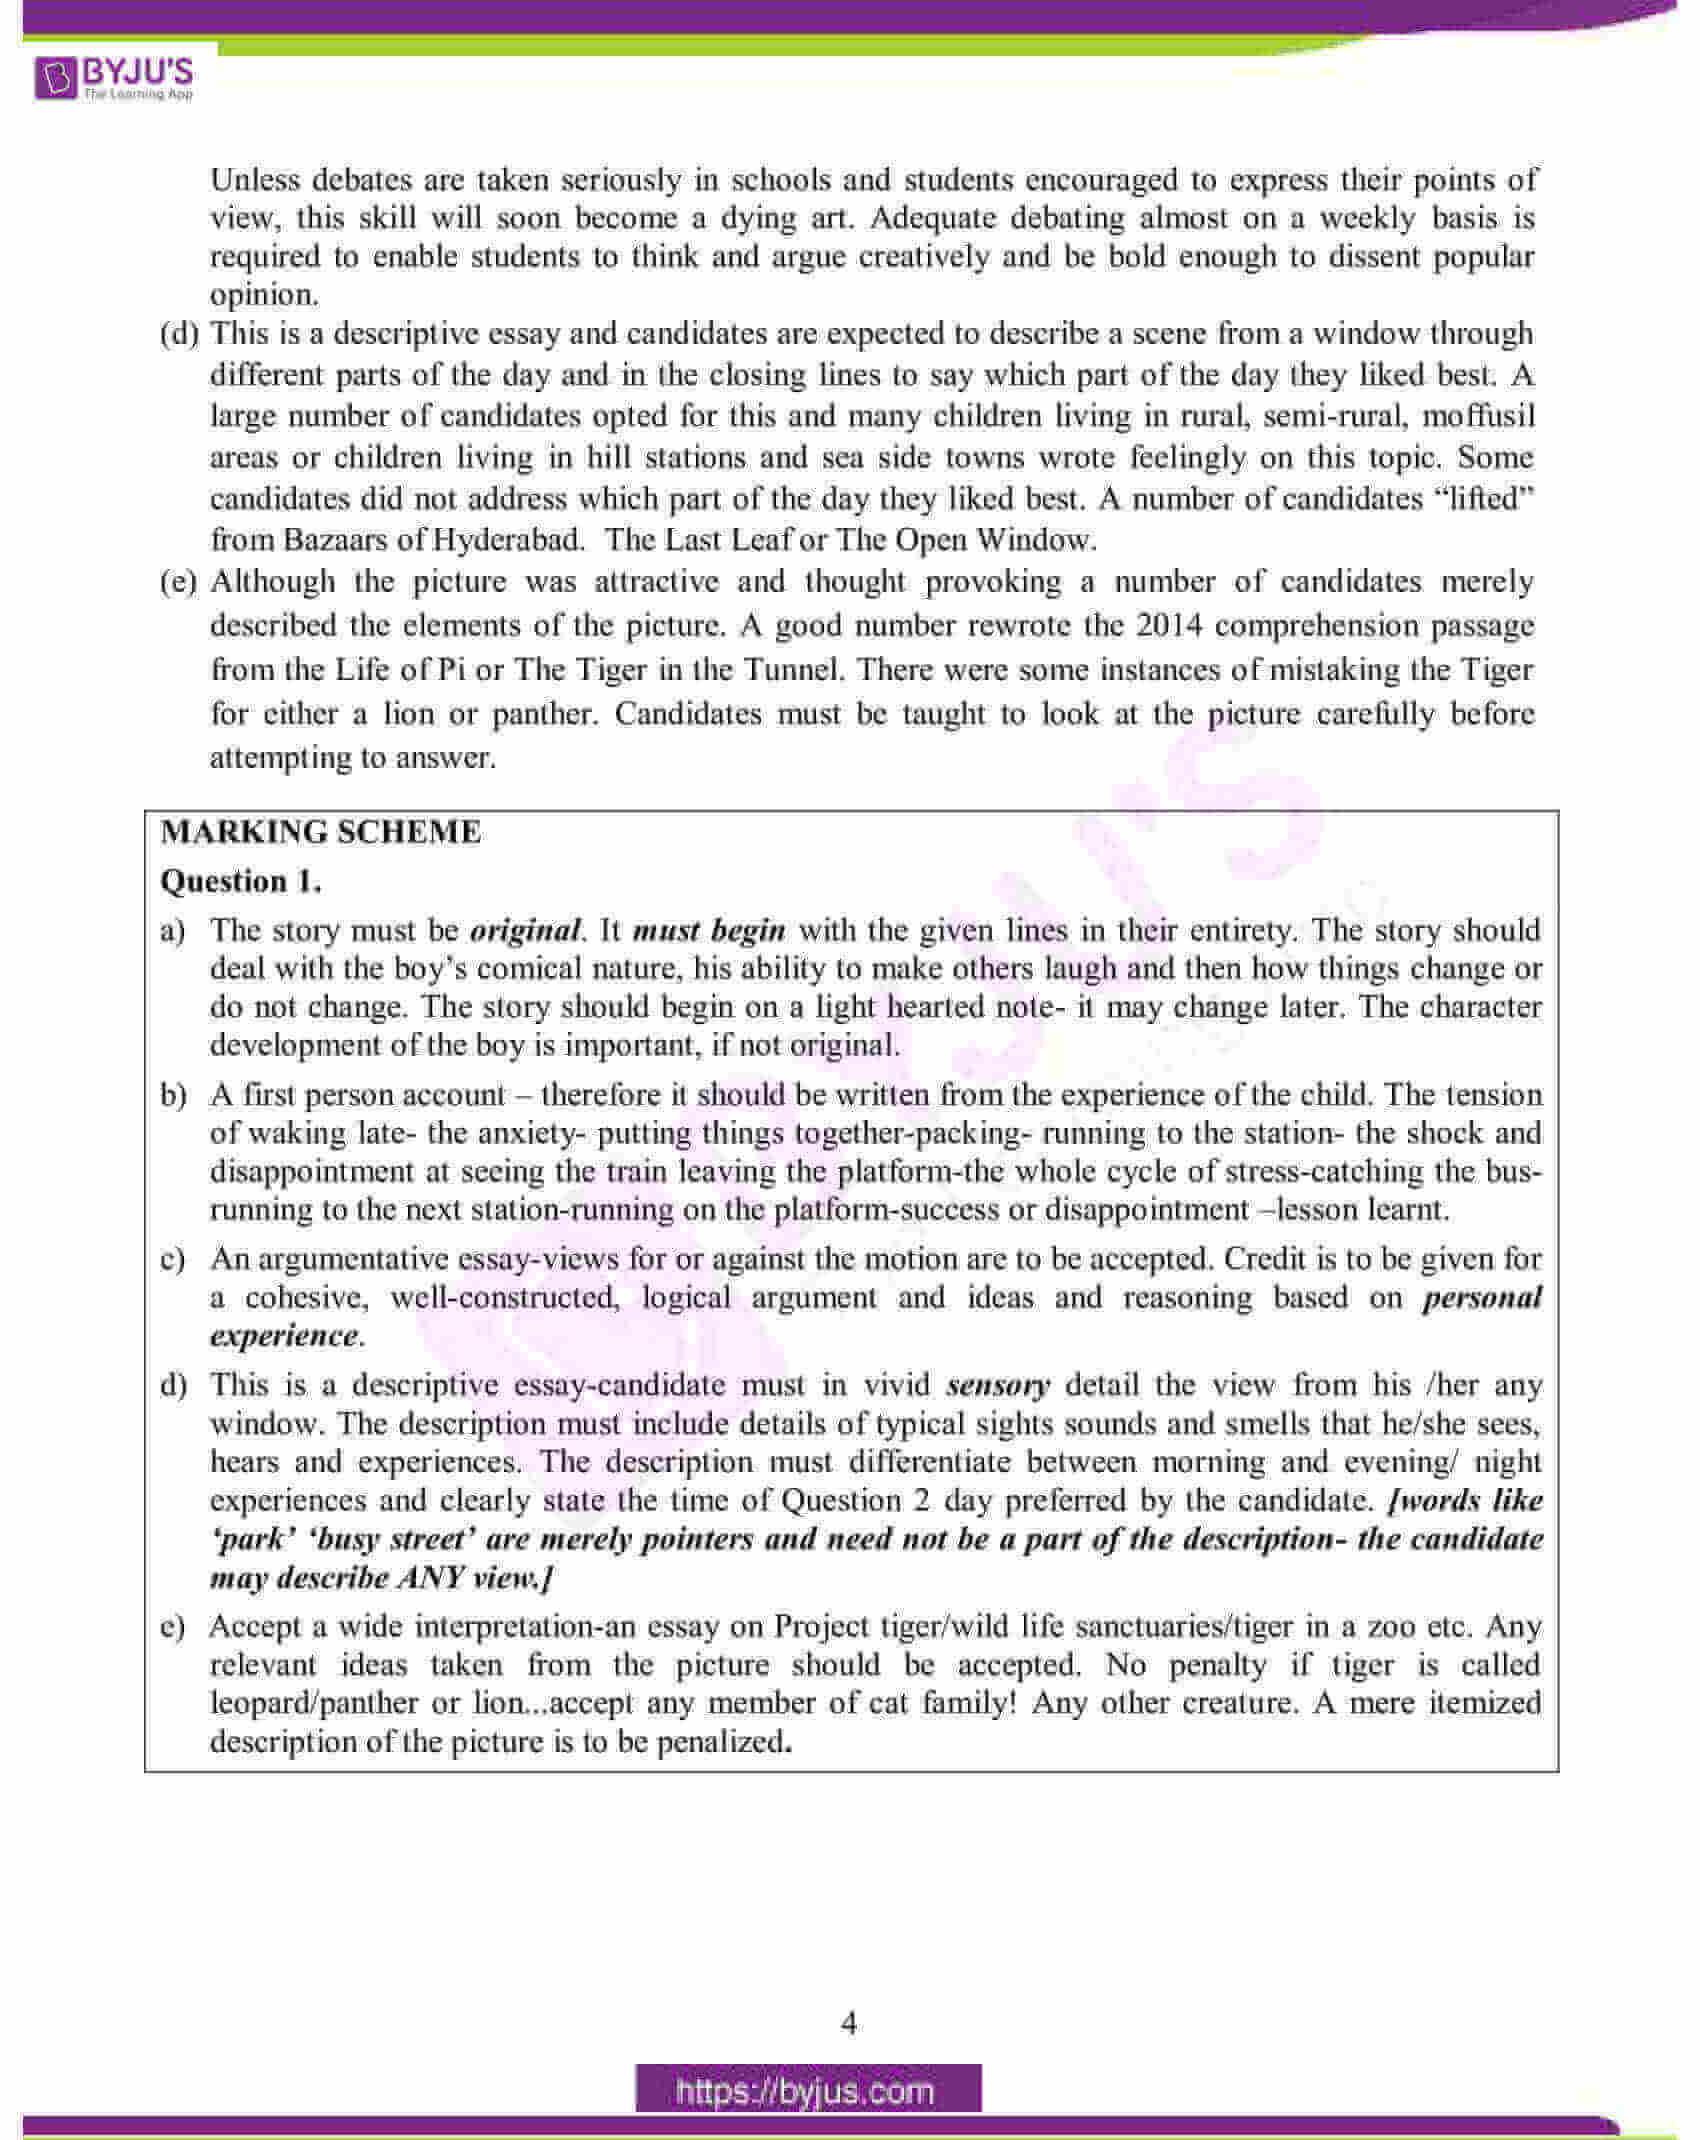 icse class 10 eng lan question paper solution 2015 03